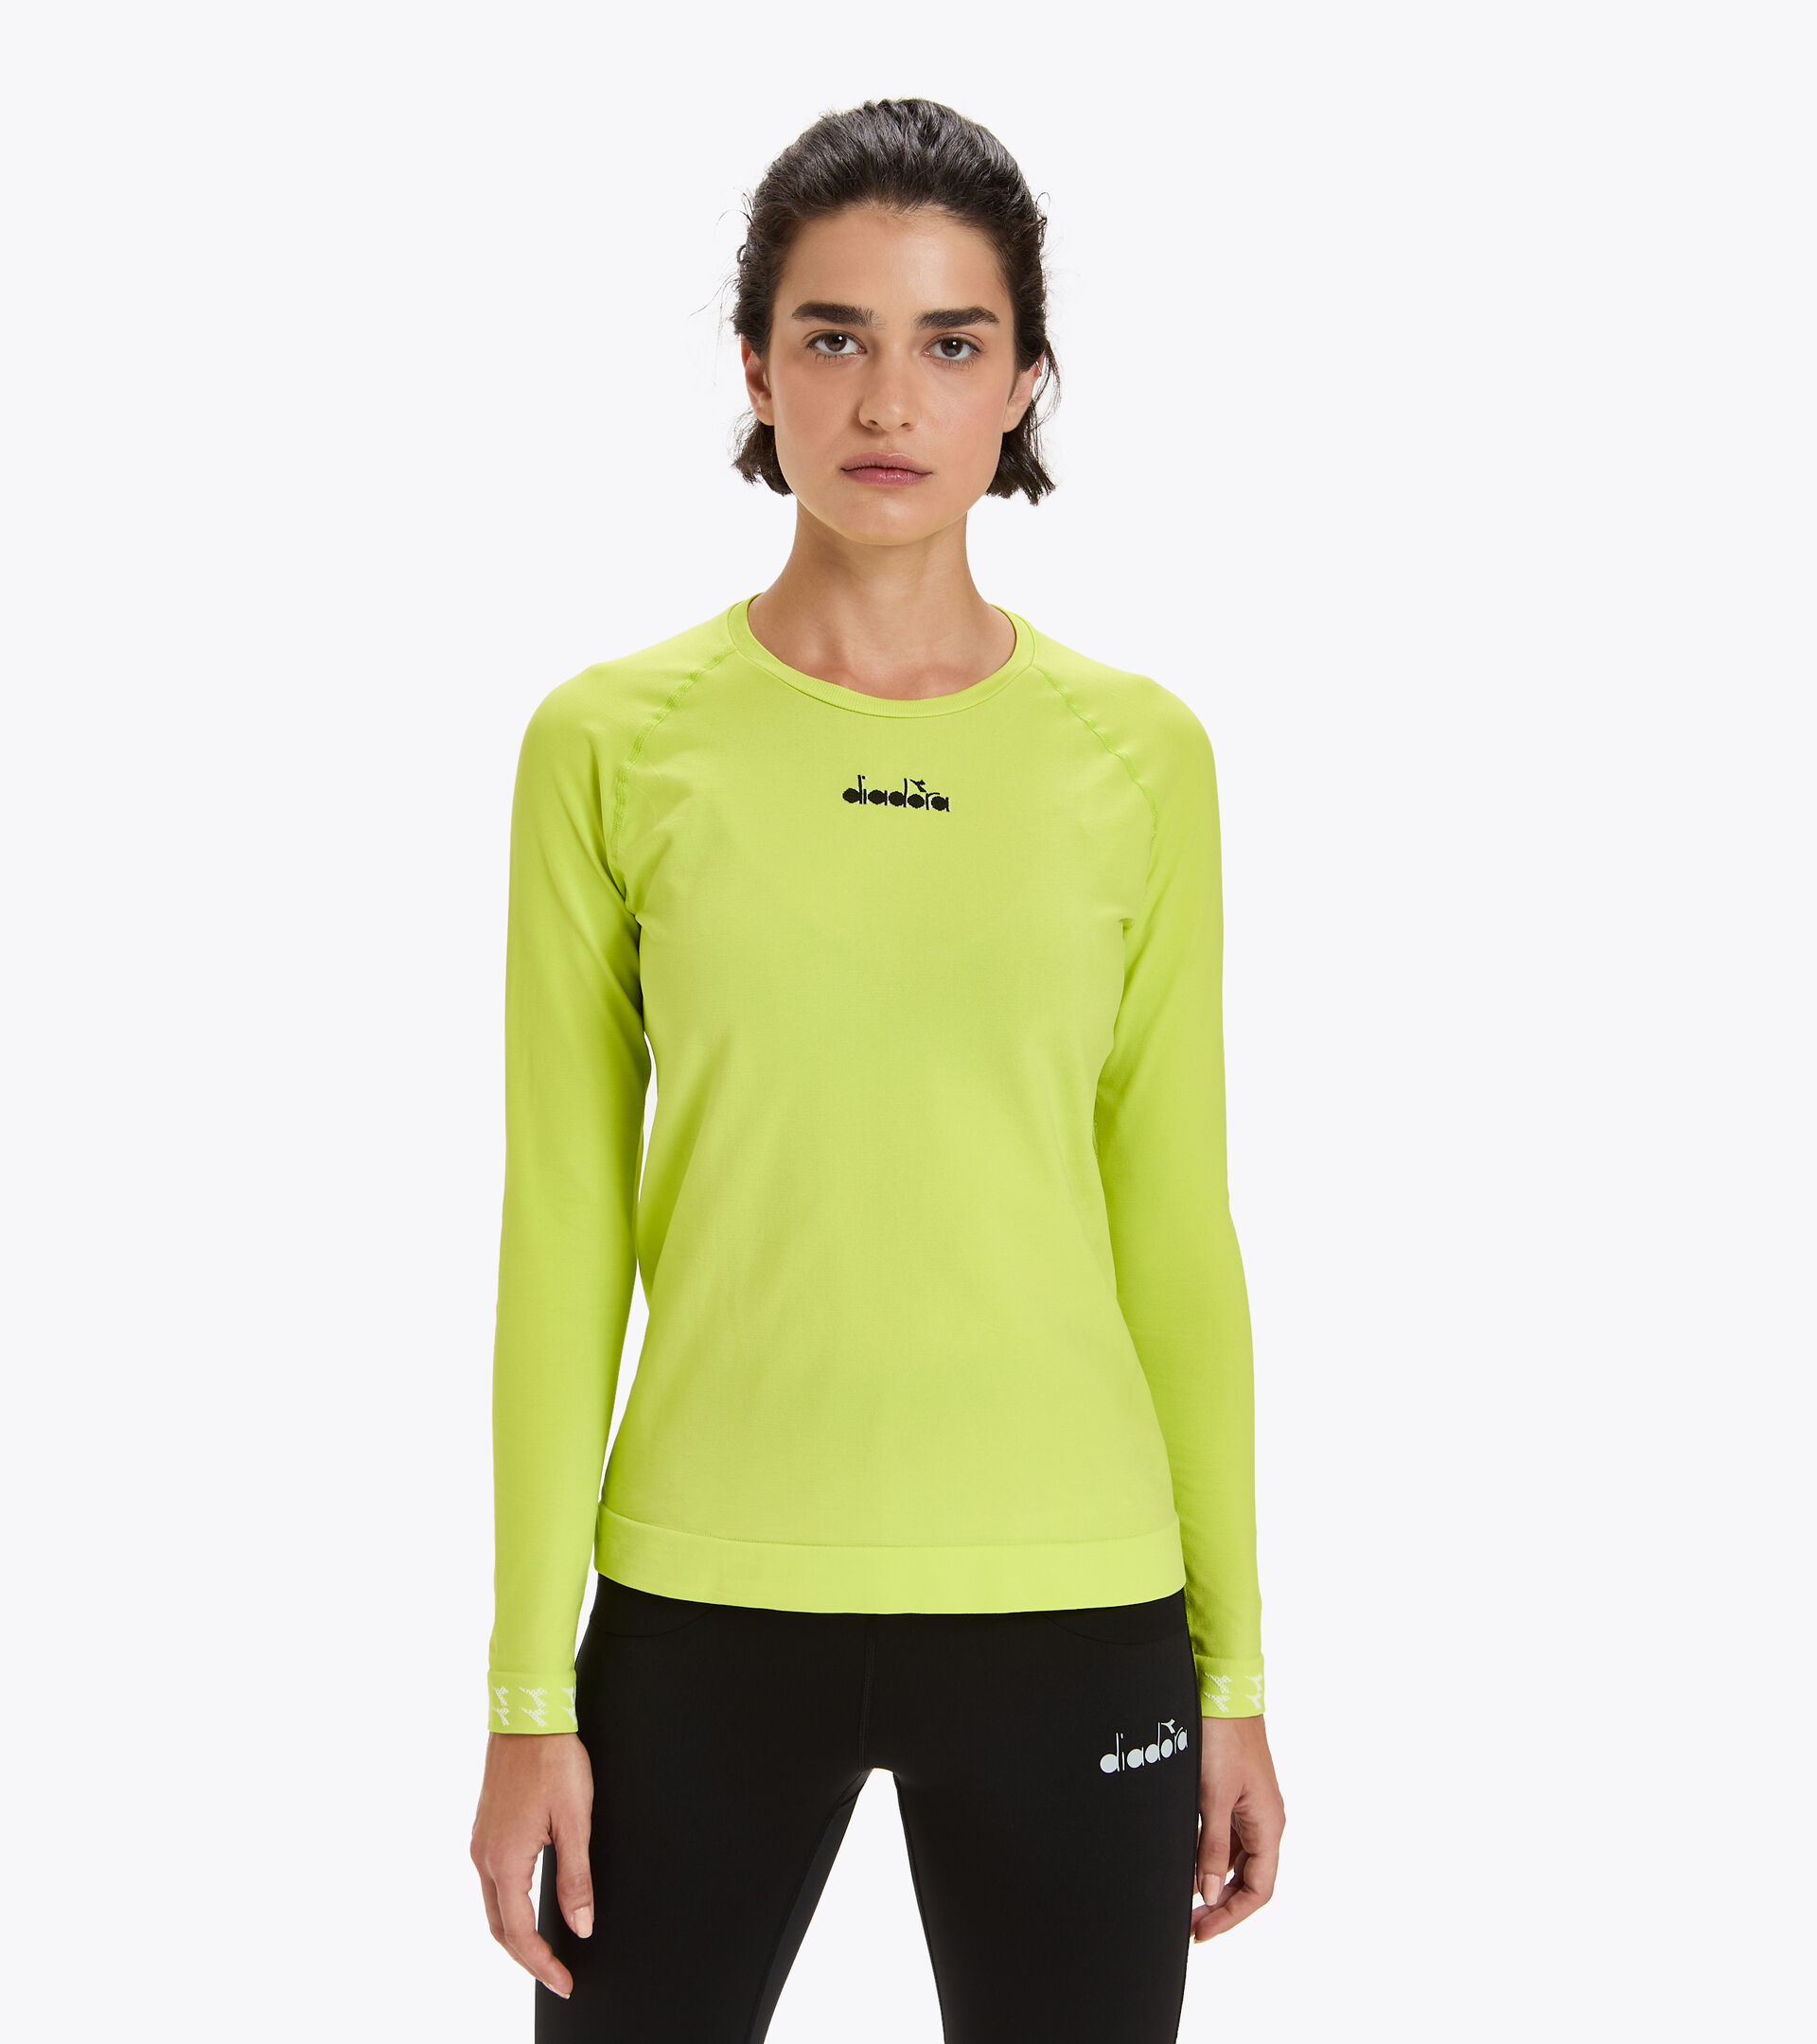 Camiseta para correr Made in Italy - Mujer L. LS SKIN FRIENDLY T-SHIRT MANANTIALES DE SULFURO - Diadora